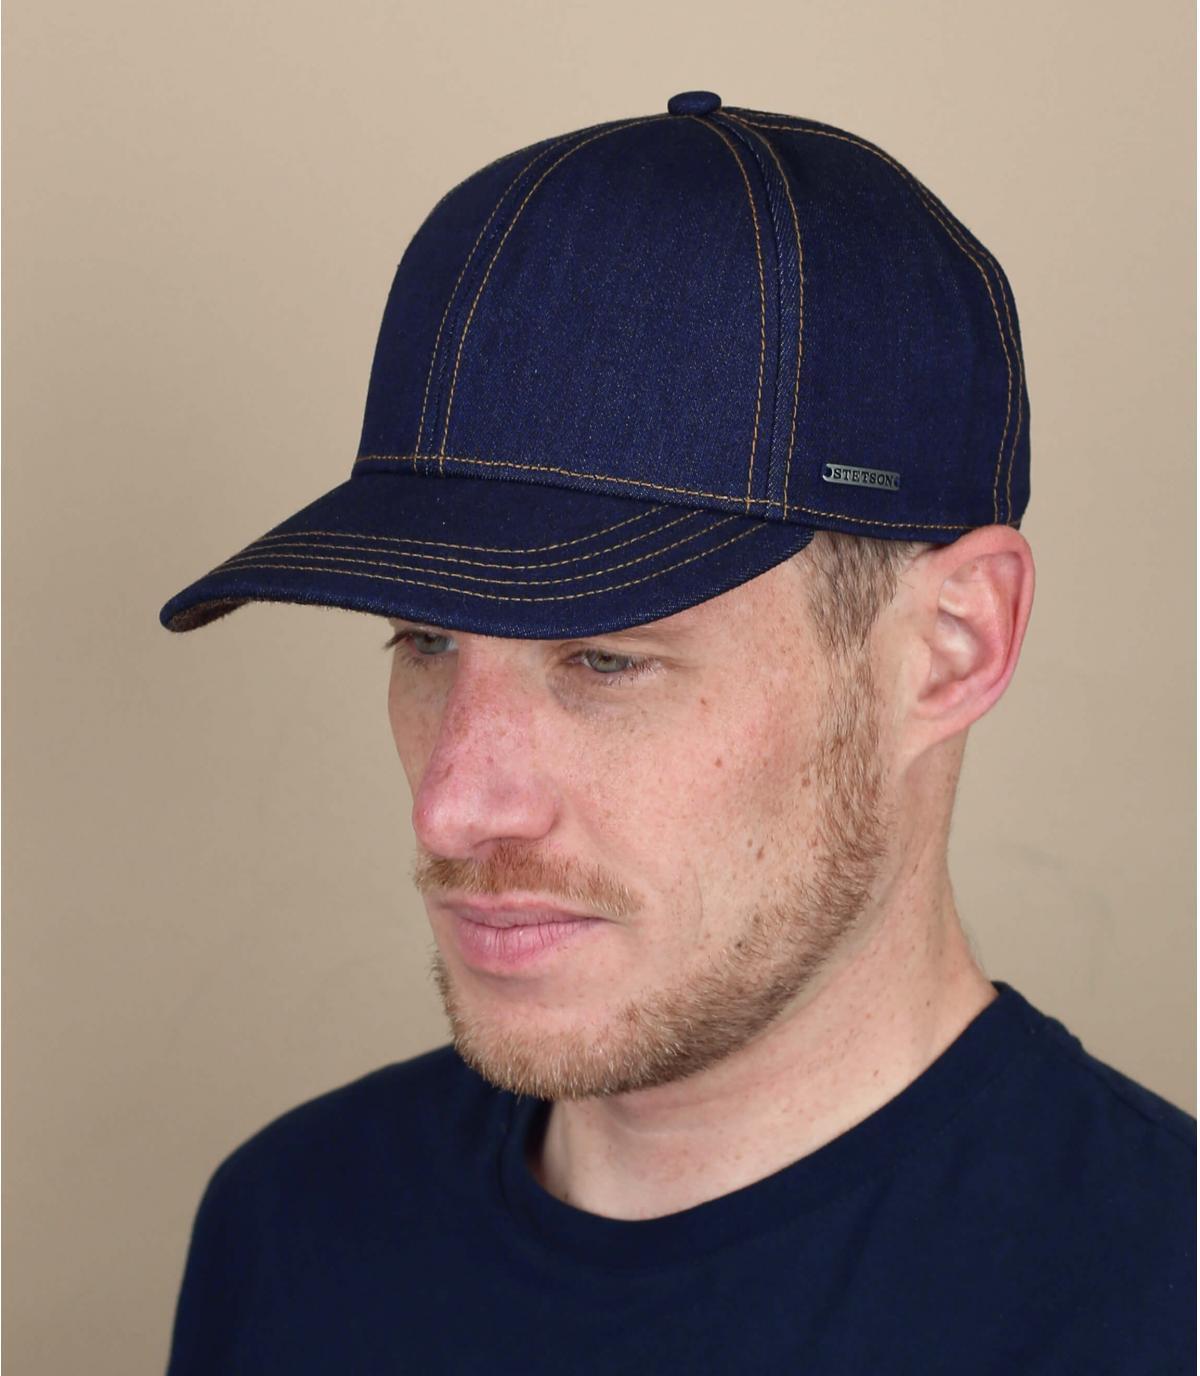 Cappellino jeans Stetson